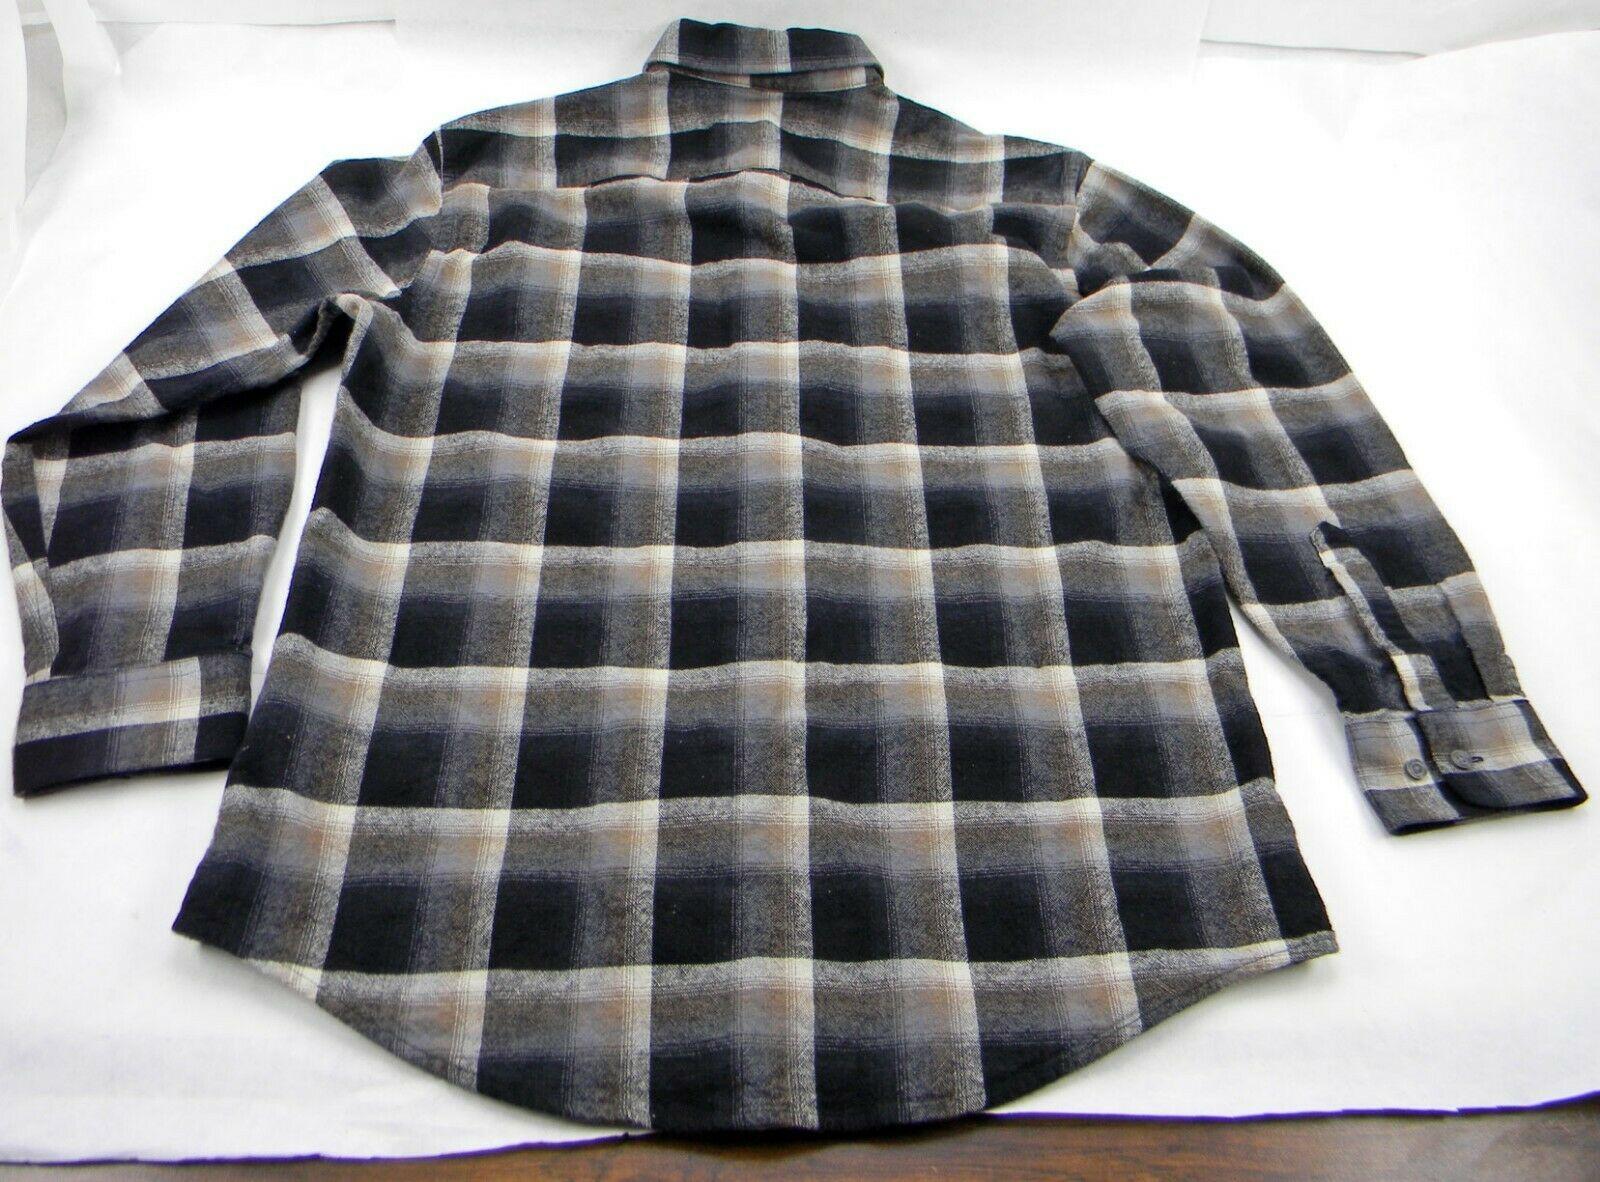 New Pendleton Mason Black Brown Ombre Plaid Long Sleeve Flannel Men's M Shirt image 4